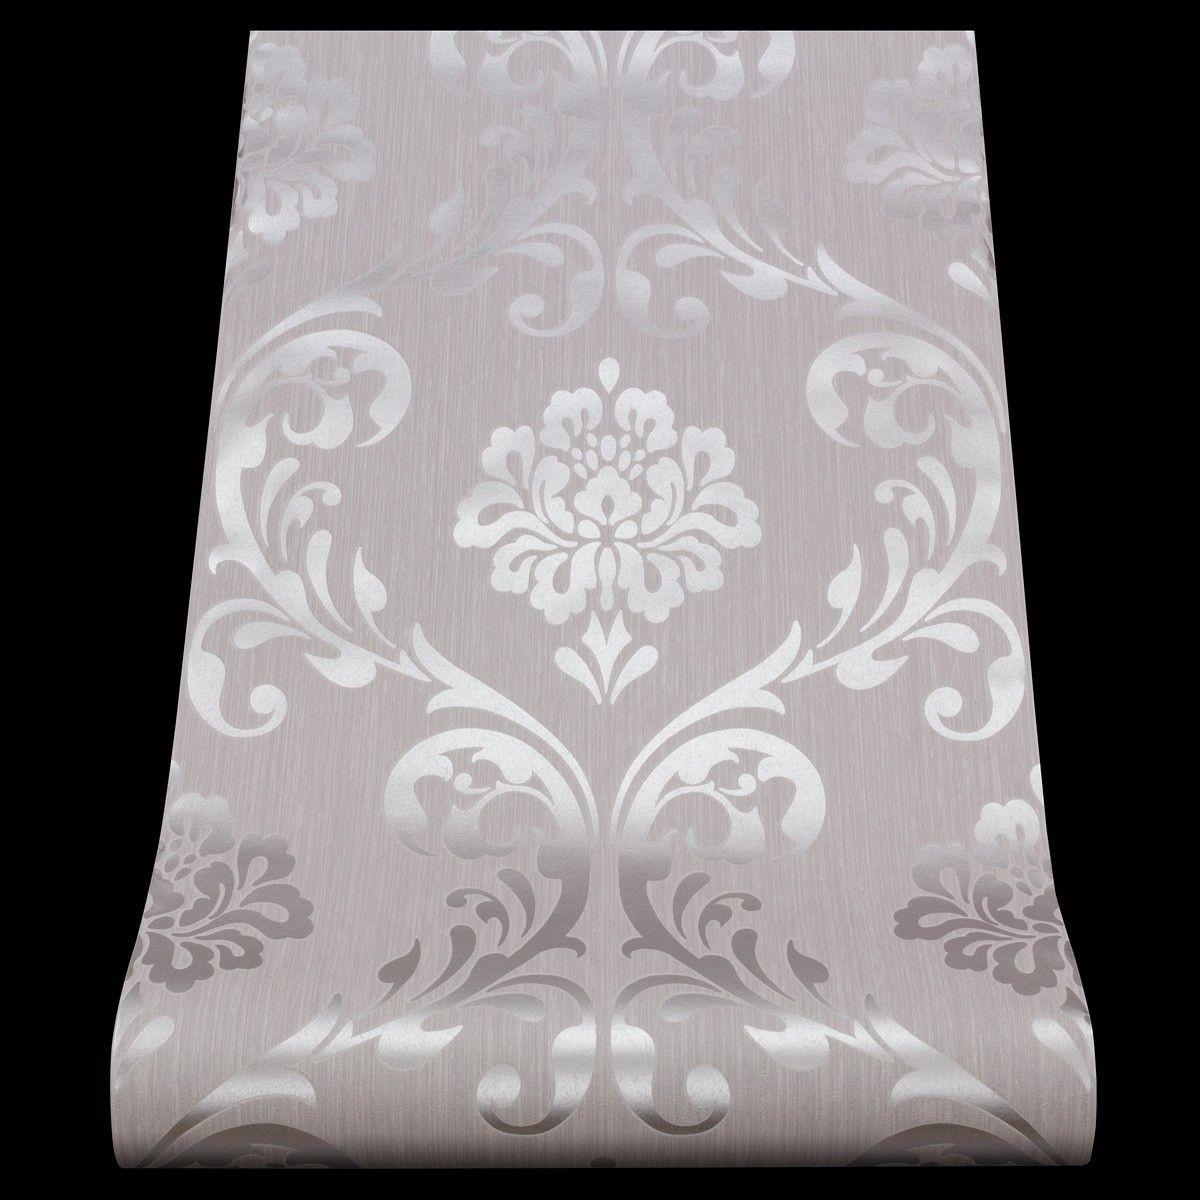 13110-50) 1 rolle vlies tapete 'ornament' barock design grau si, Schlafzimmer entwurf